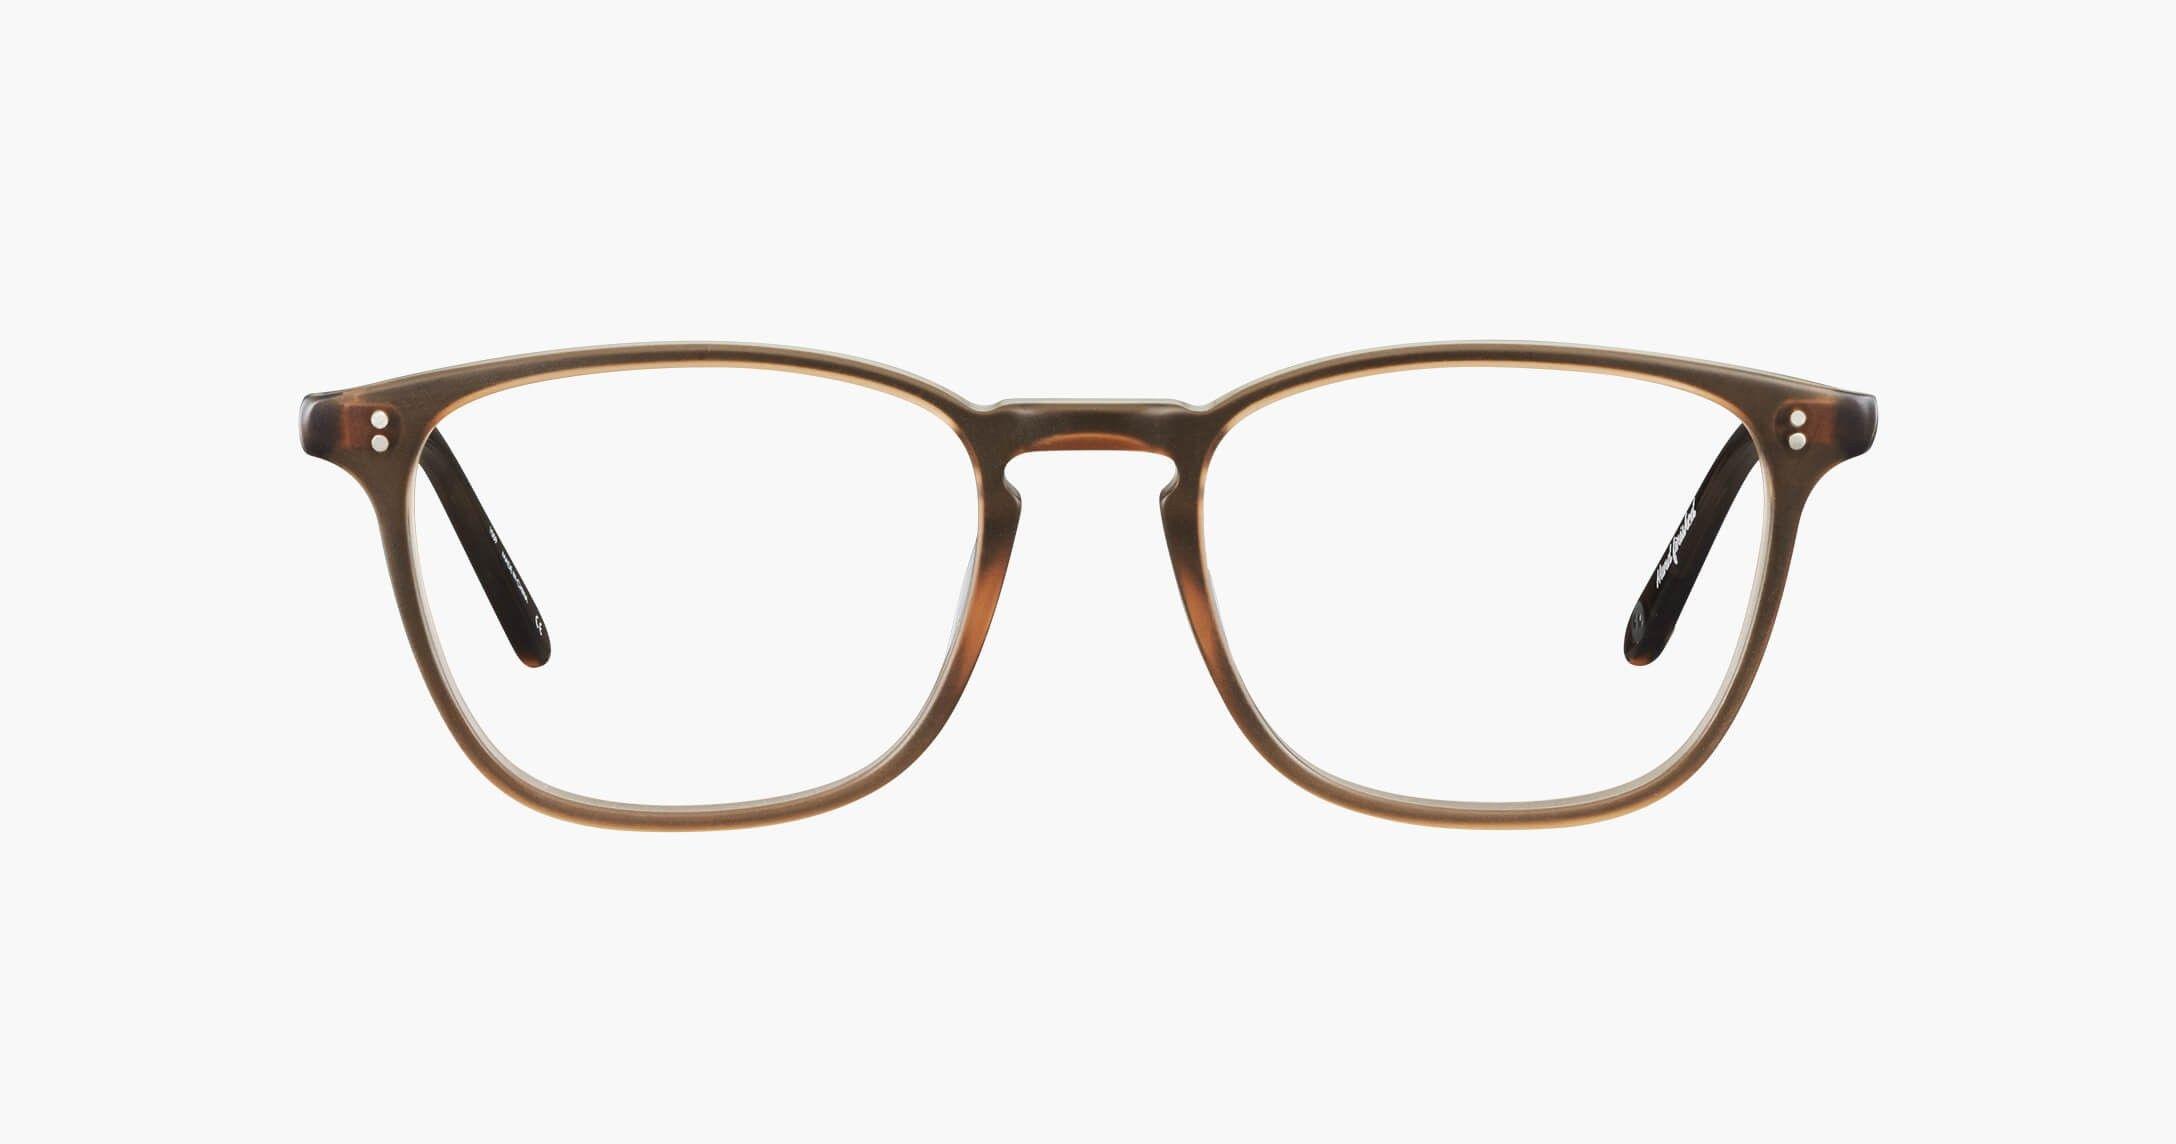 fe8f5b3578043 Descendants Costumes RayBan Rx5255 51 Eyeglasses RX5255 5487 Gradient Brown  On Orange 51 16 135        AMAZON BEST BUY